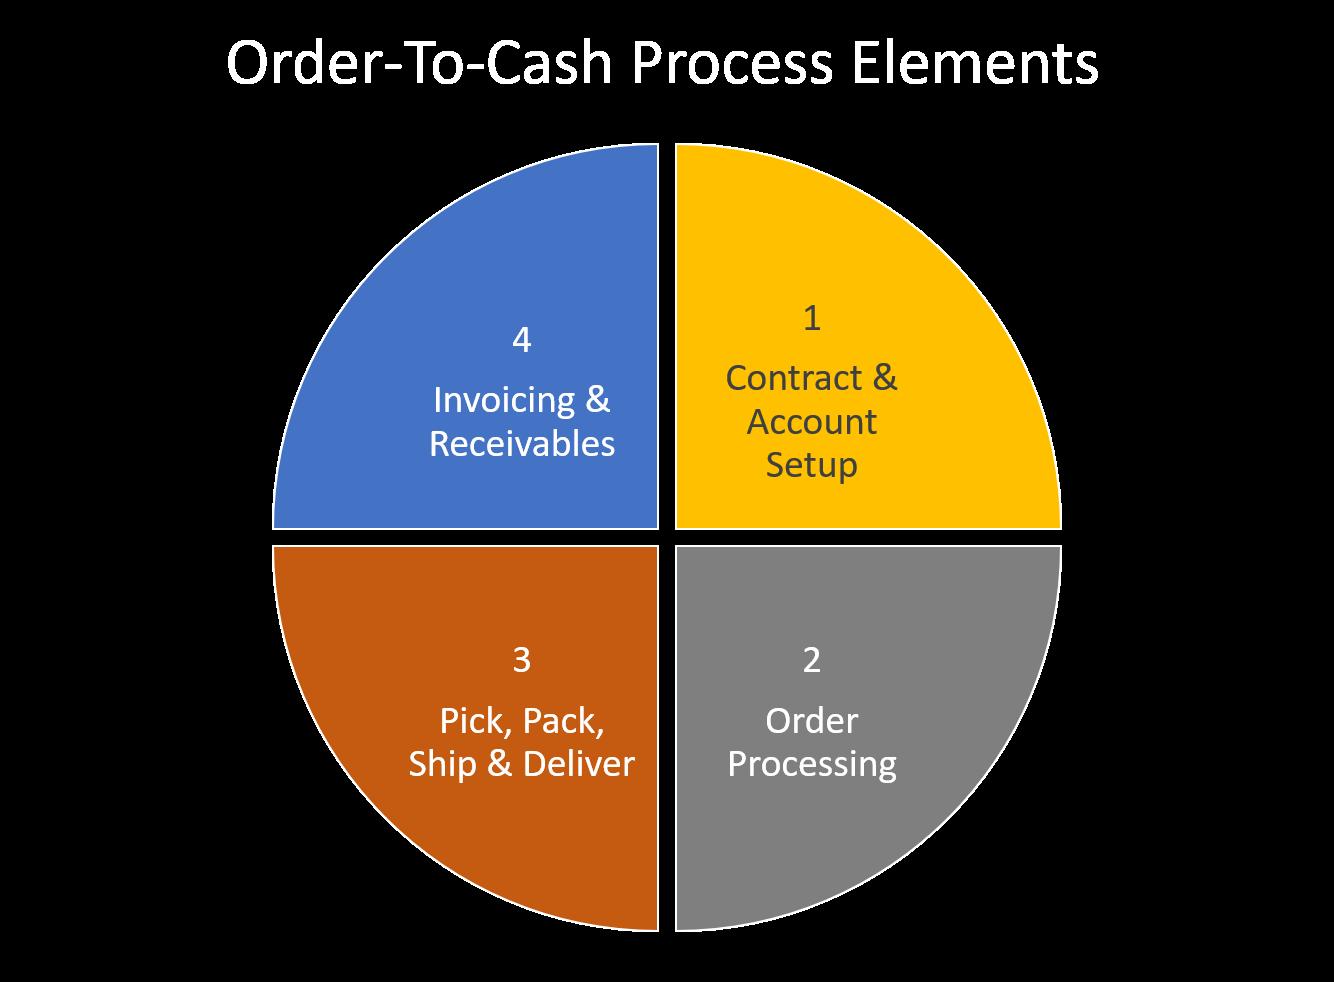 OTC Process Elements